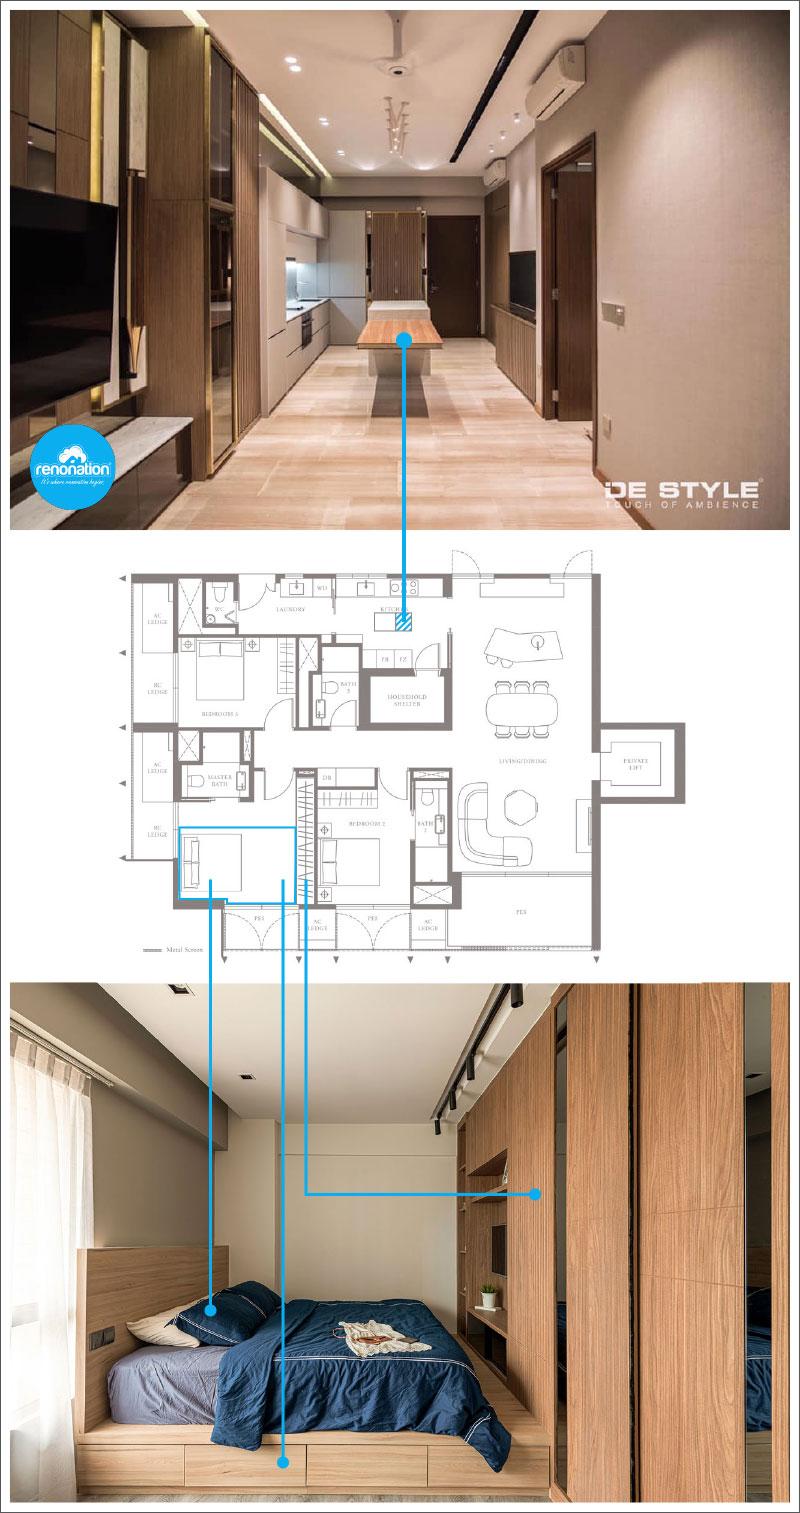 MEYERHOUSE - Designs: De Style Interior and Earth Interior Design